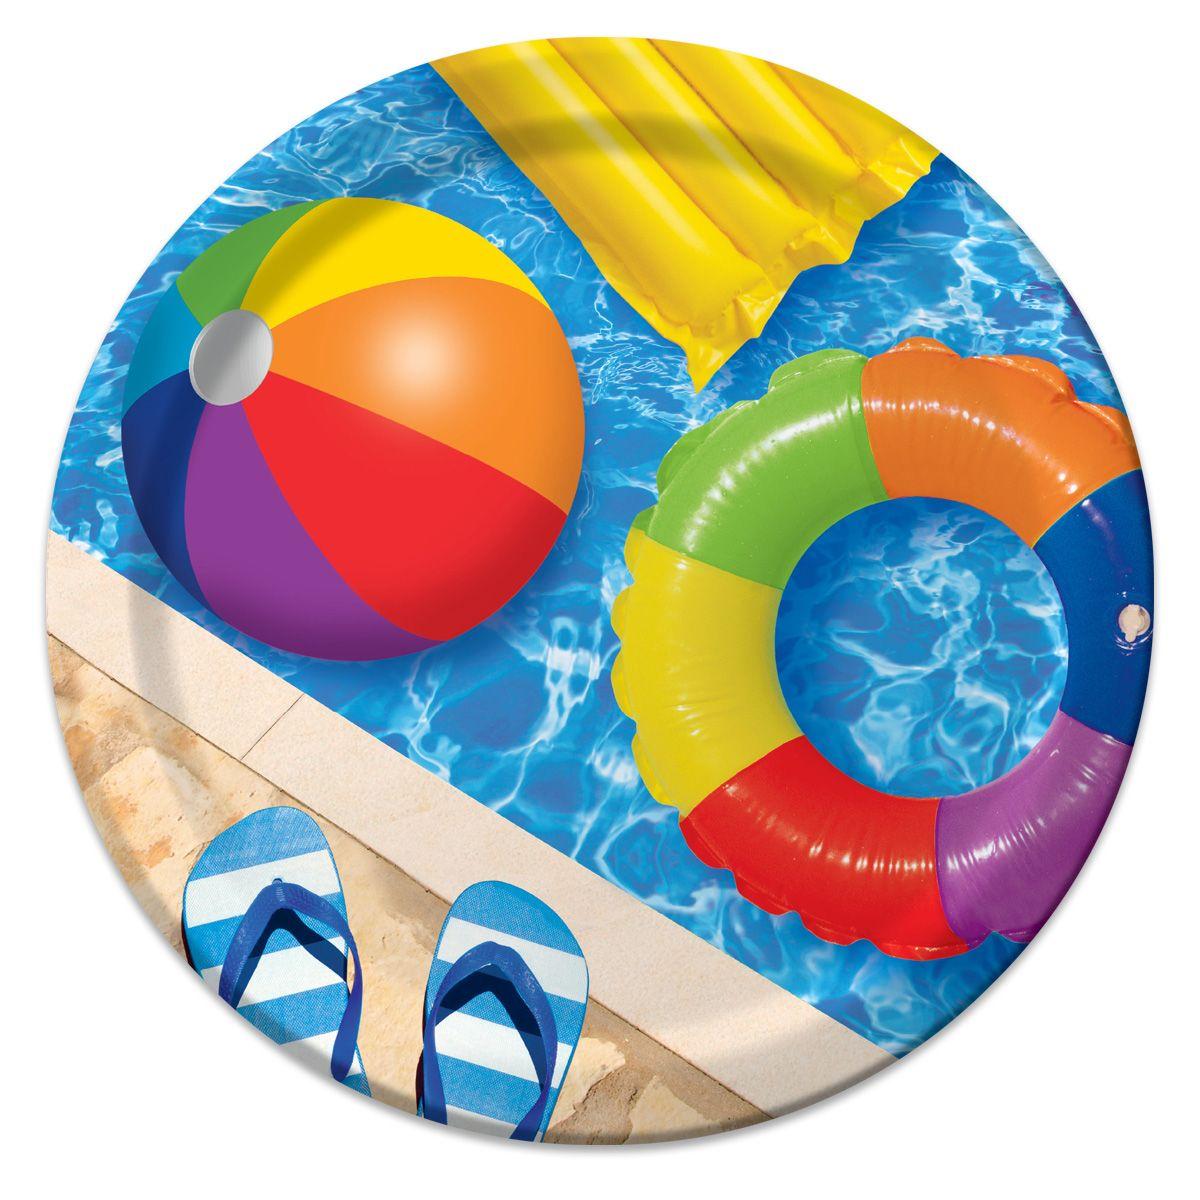 "Pool Party Plates - 8 3/4"""" - 8 Per Unit"" PAP2200DPUN"